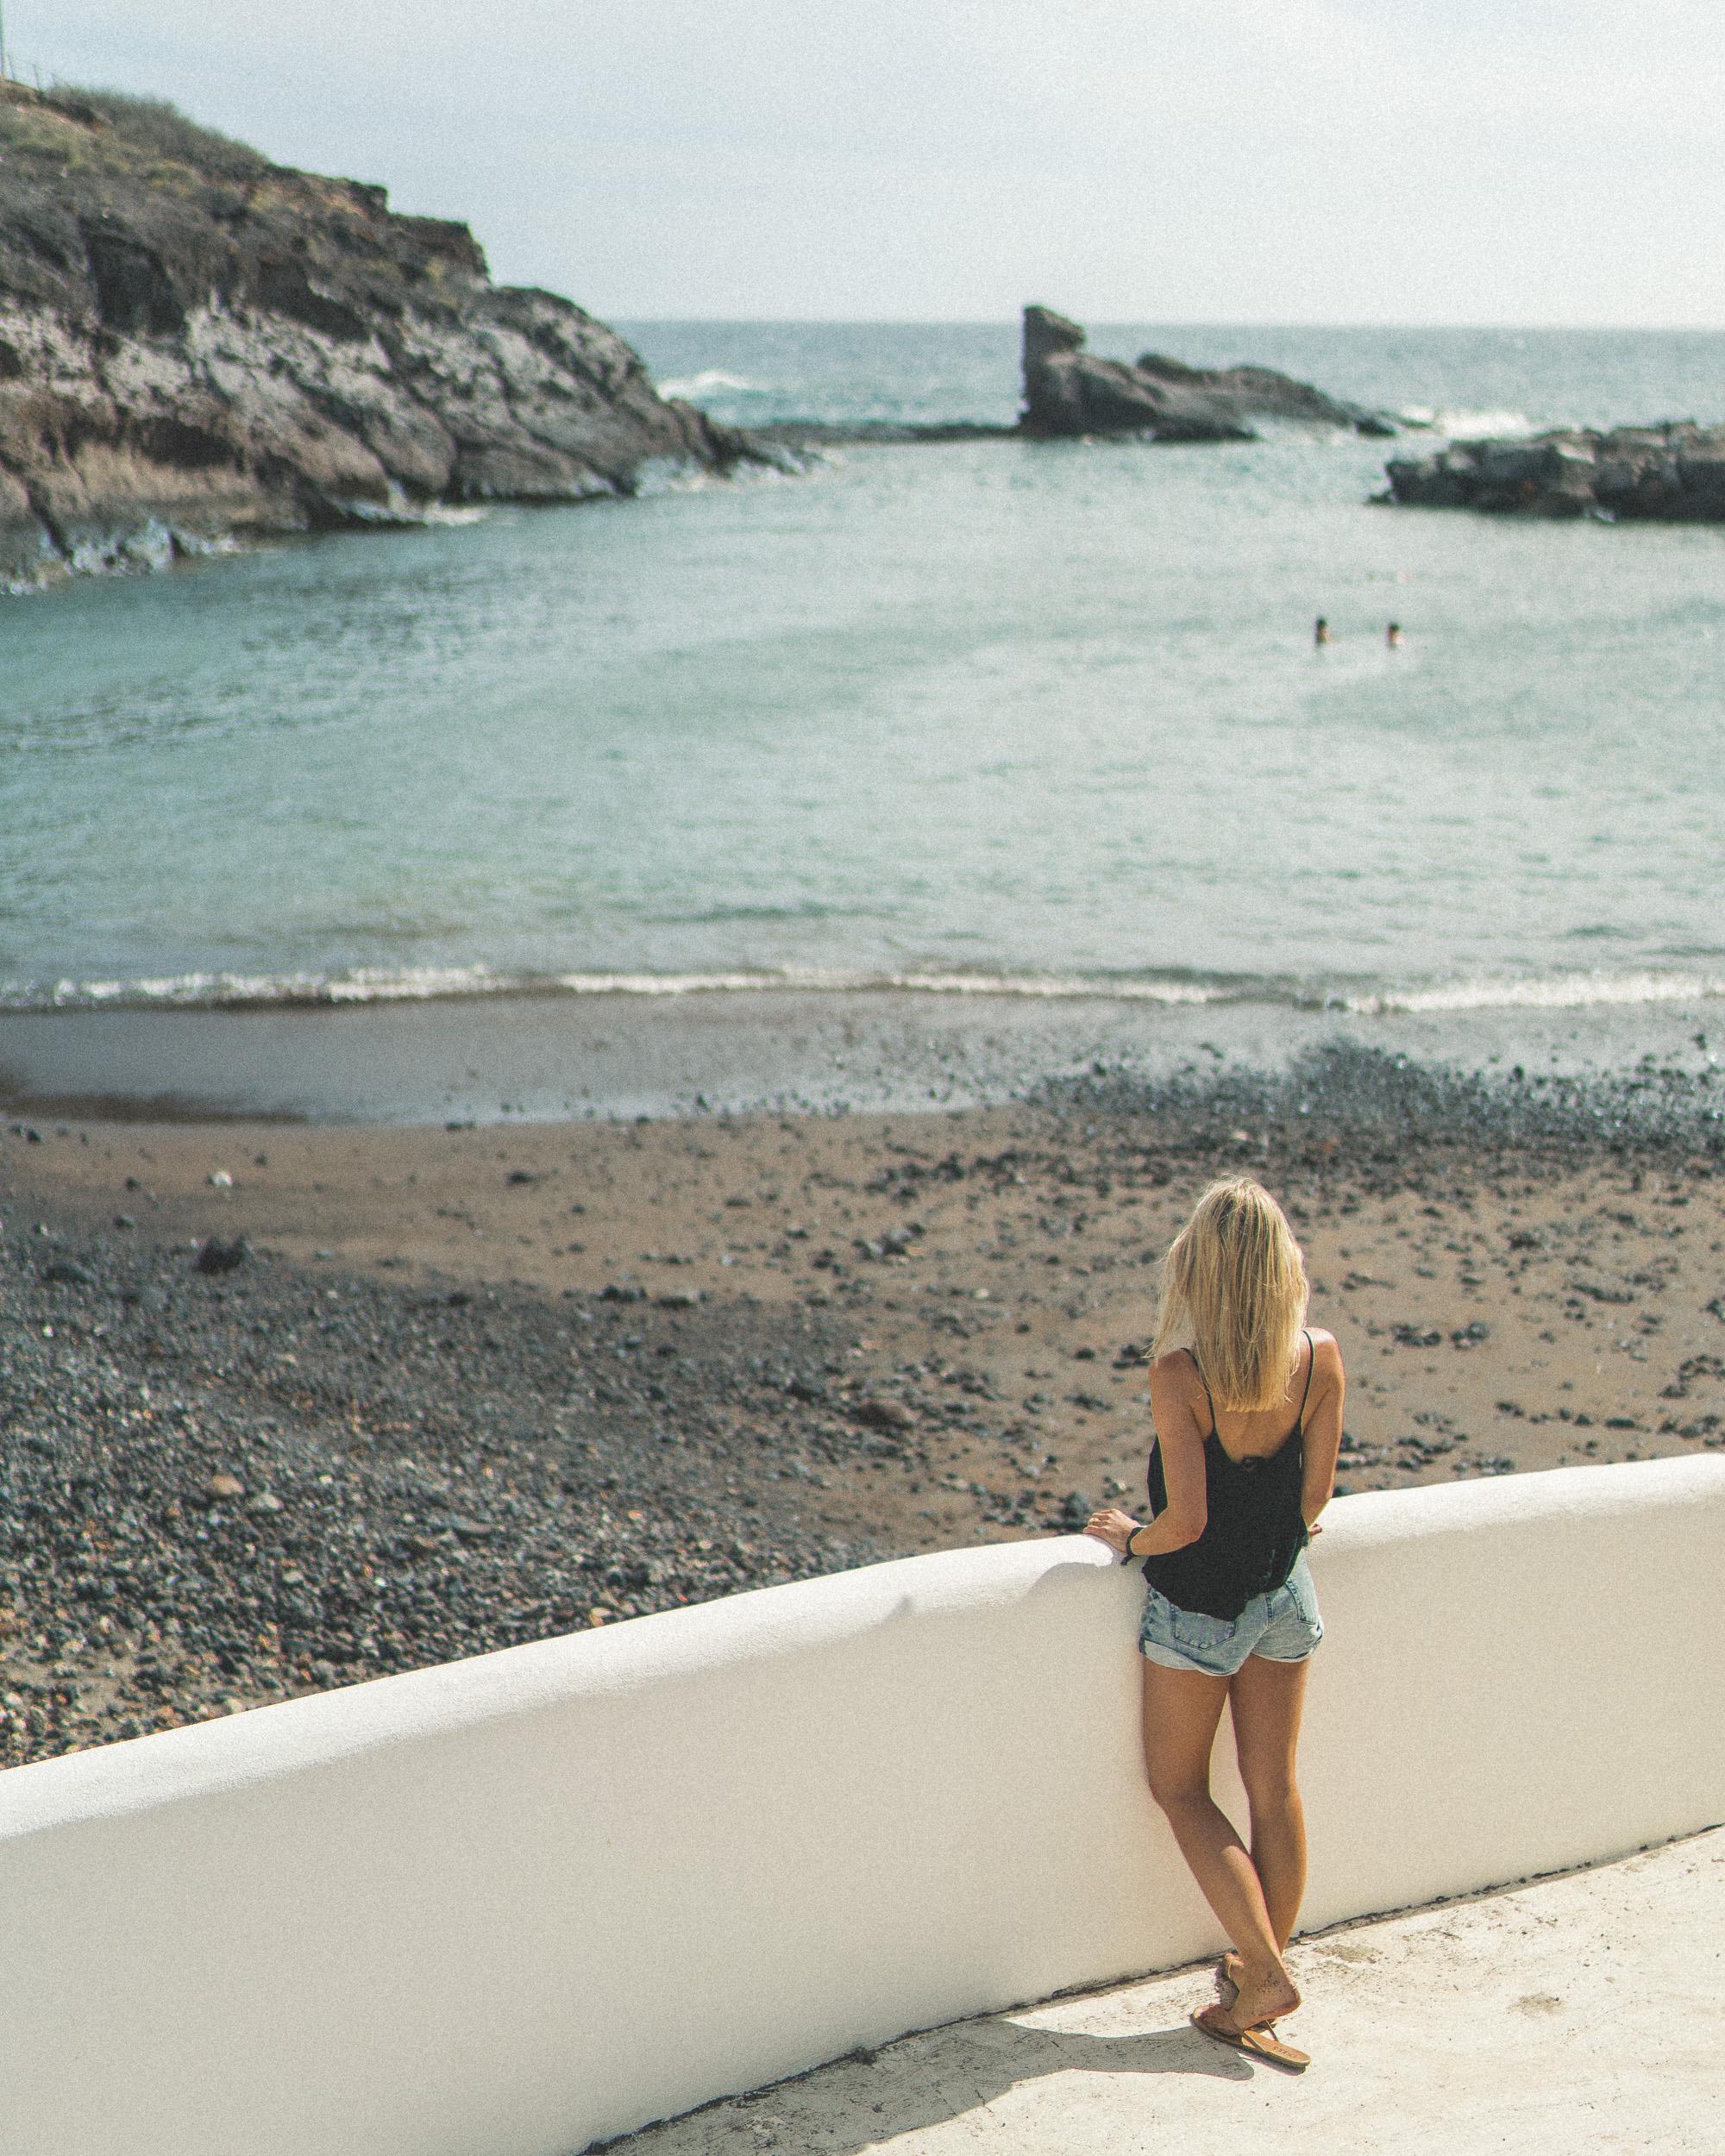 Island Beach People: Hidden Gems In Tenerife, Canary Islands